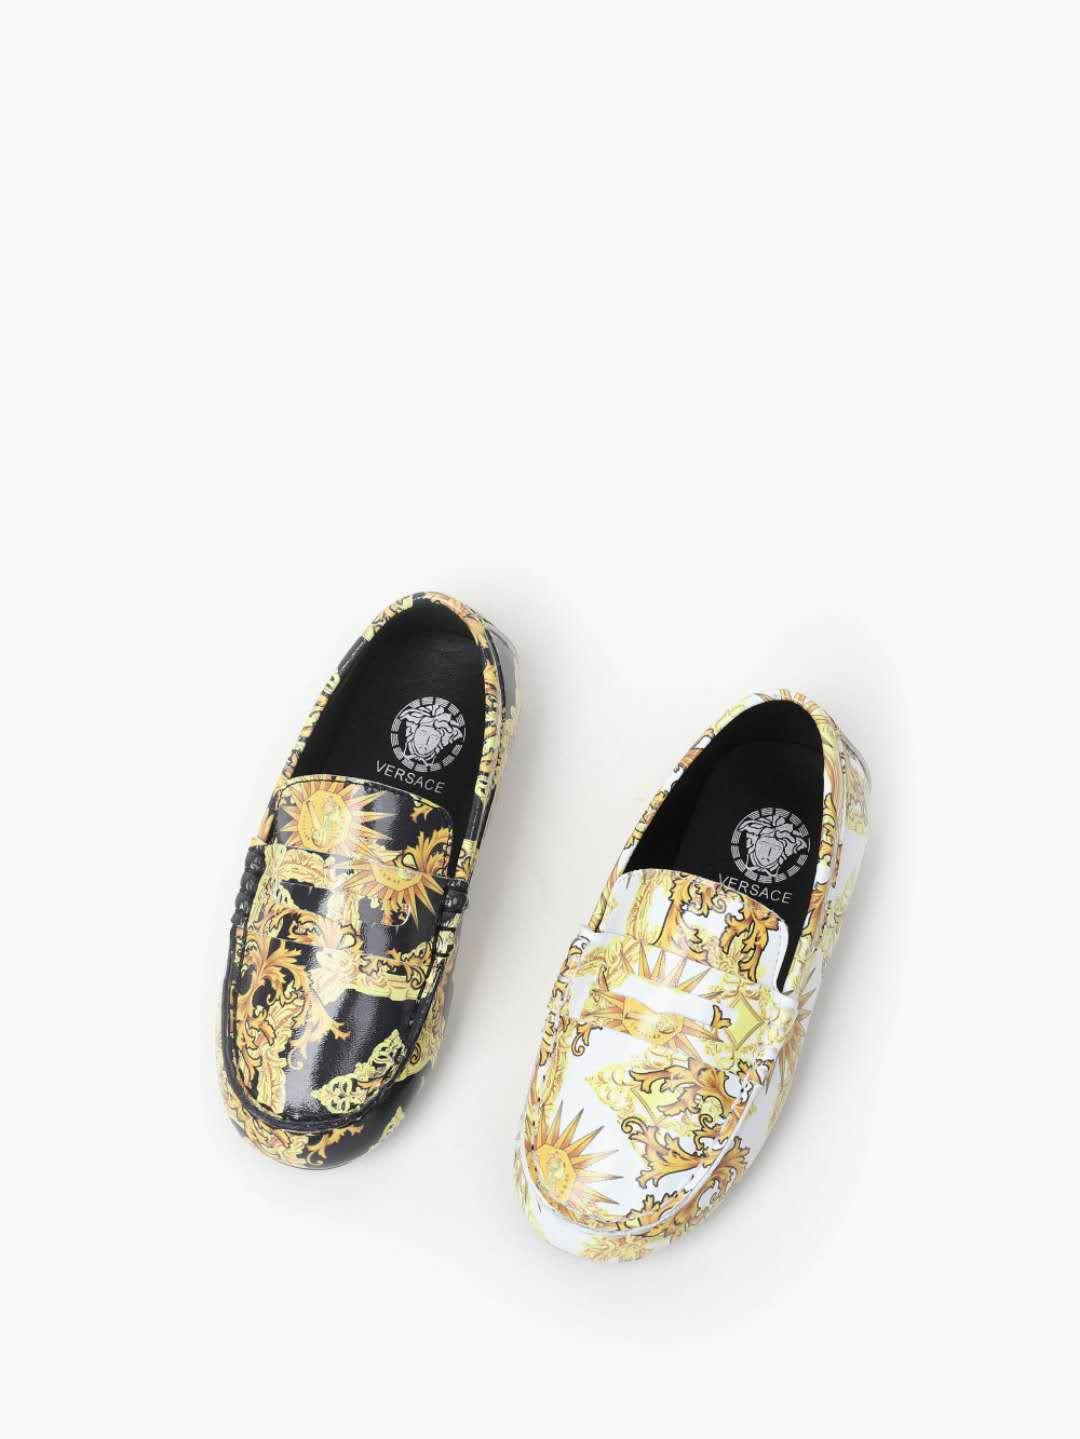 boy shoe kid fashion school athletic shoe kids toddler cheap kids summer sport sneakers flower design 2020ss summer new free shipping